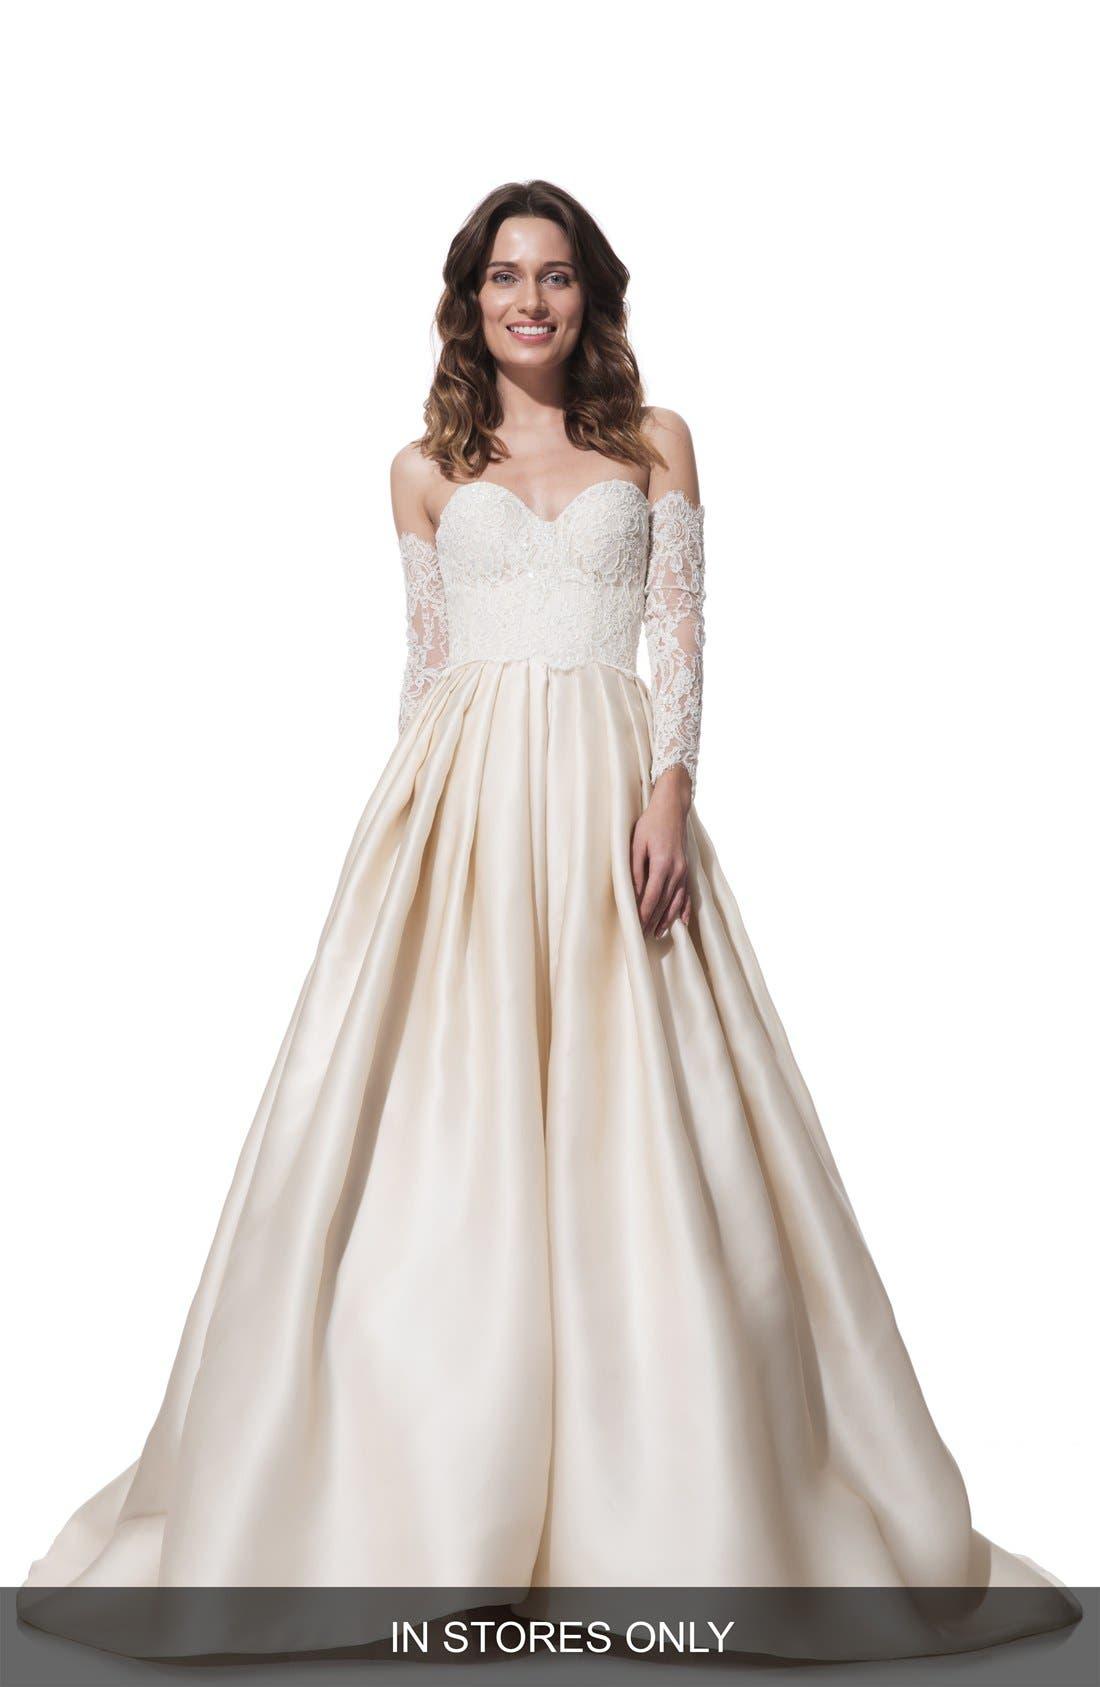 Clara Lace & Silk Organza Ballgown Dress,                             Main thumbnail 1, color,                             270